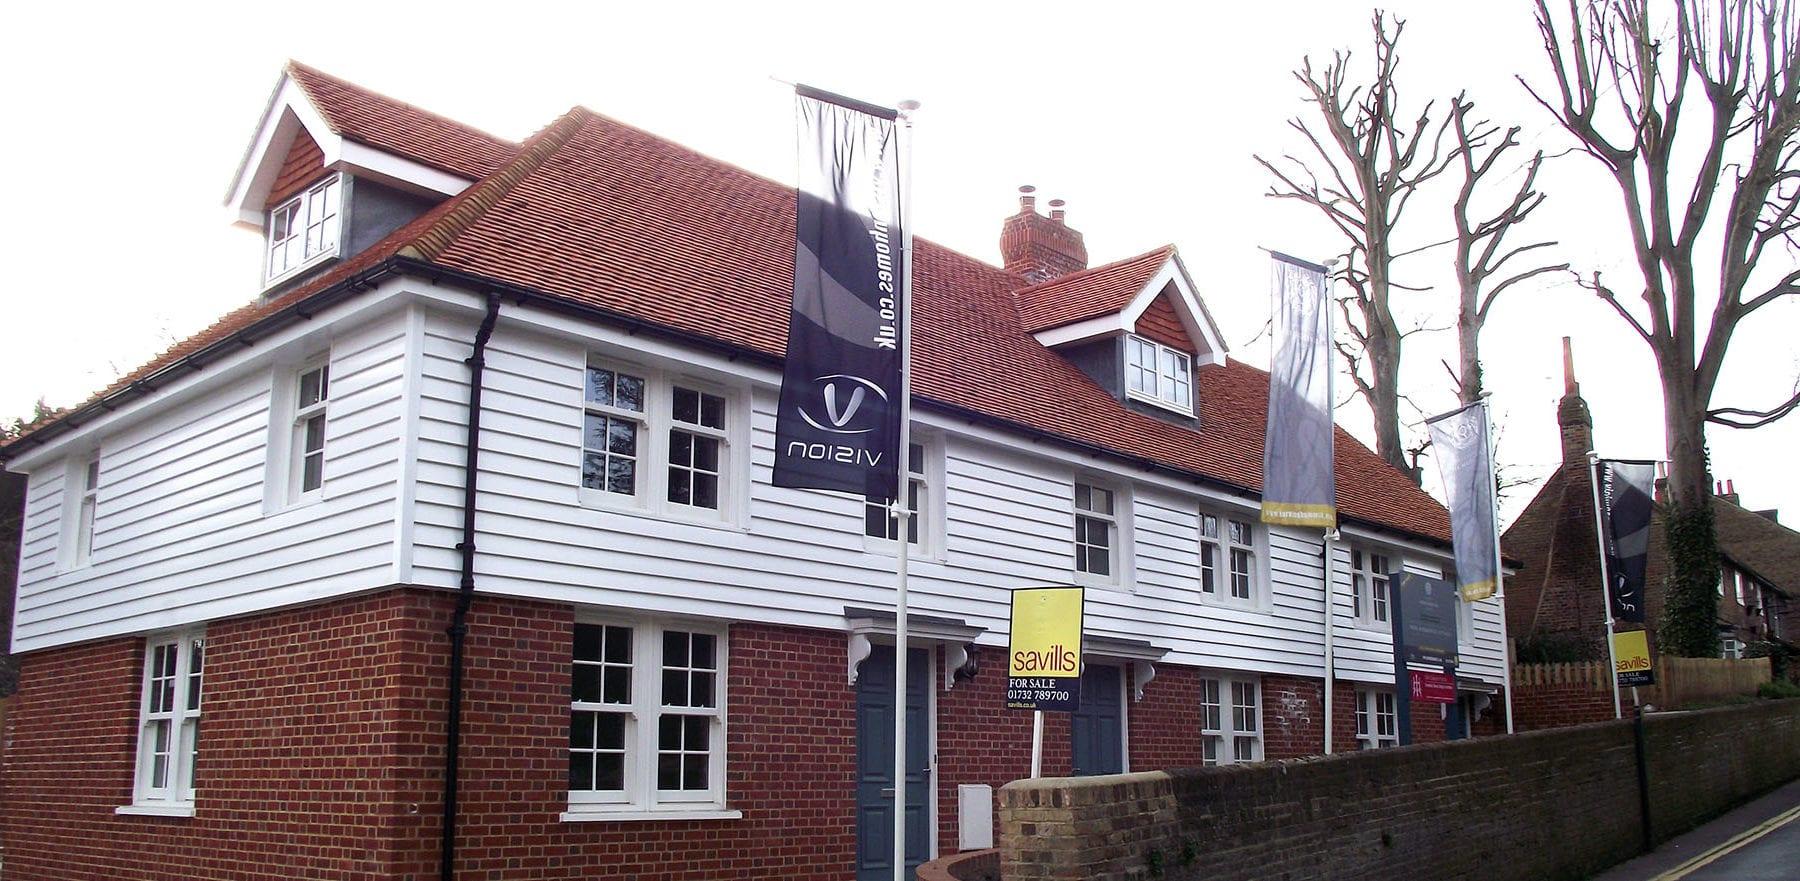 Lifestiles - Handcrafted Orange Clay Roof Tiles - Farningham, England